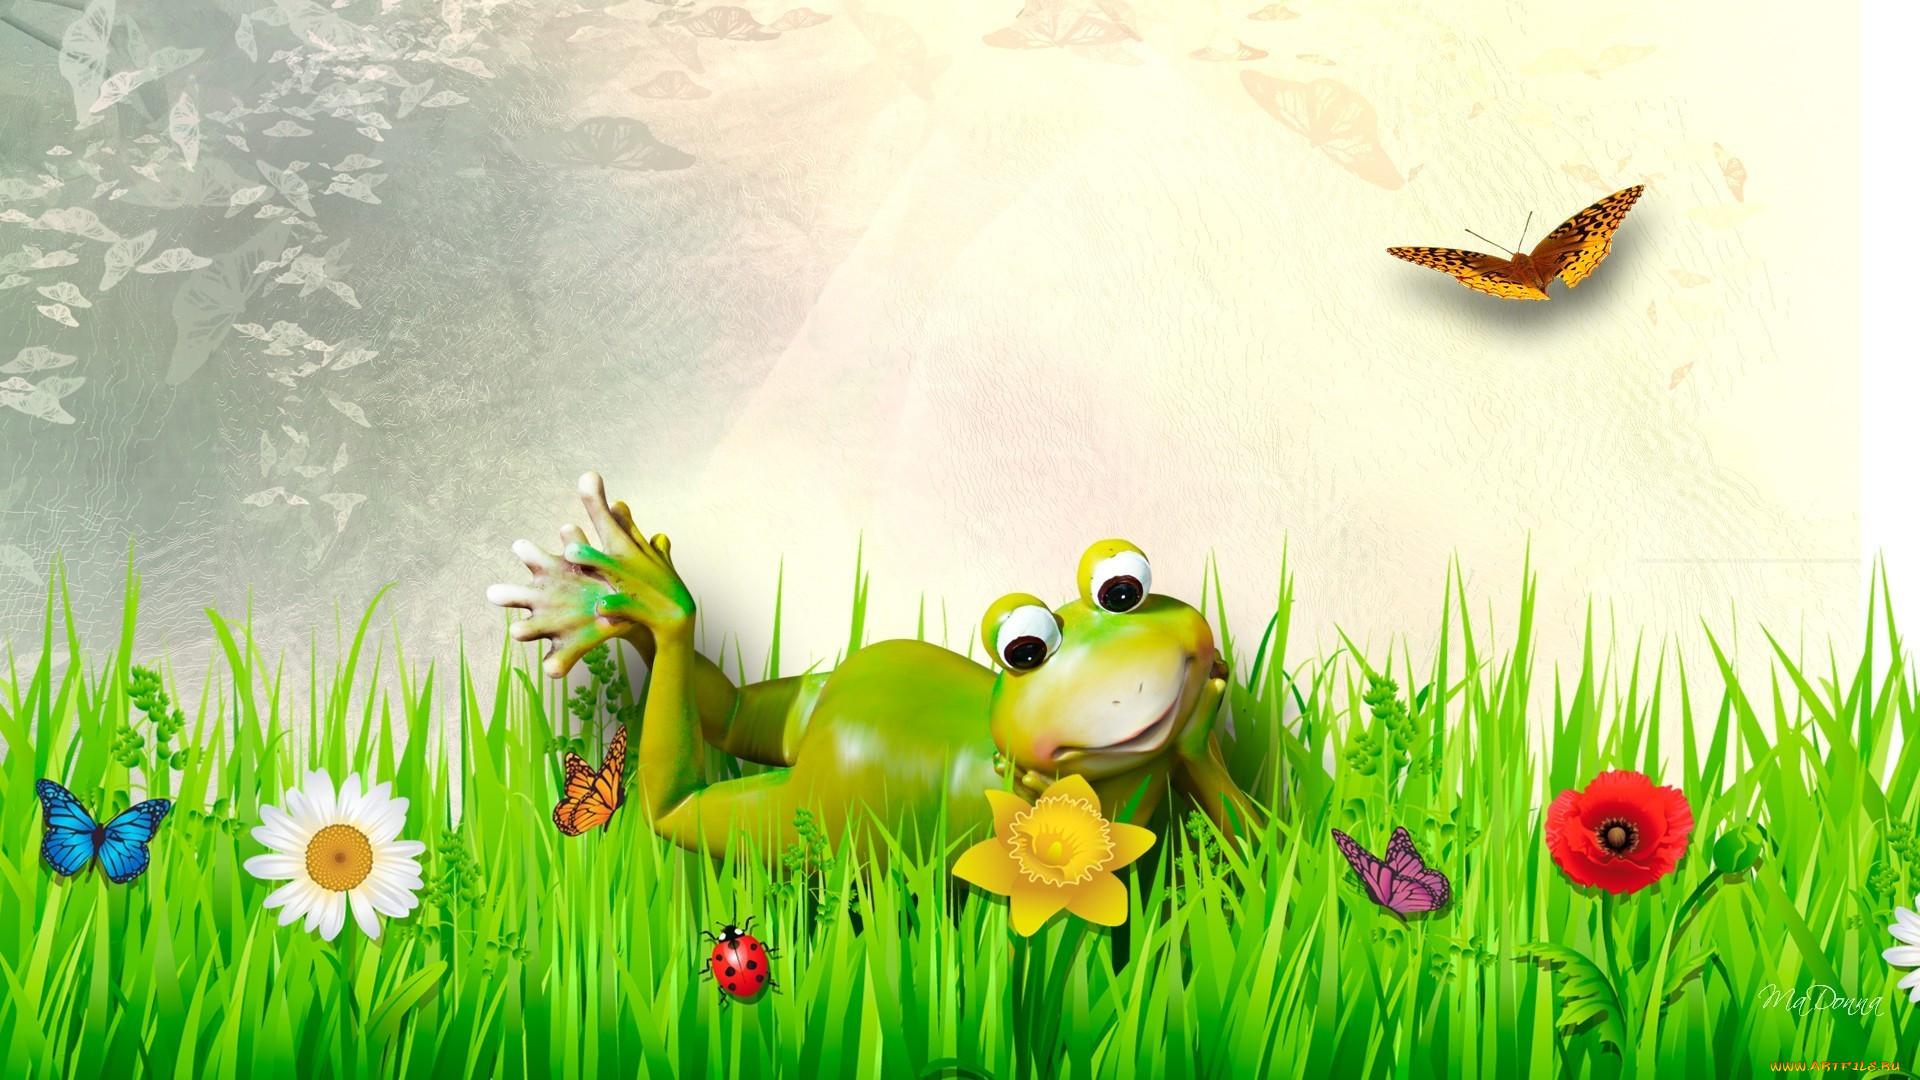 Картинки с добрым утром с бабочками и лягушками